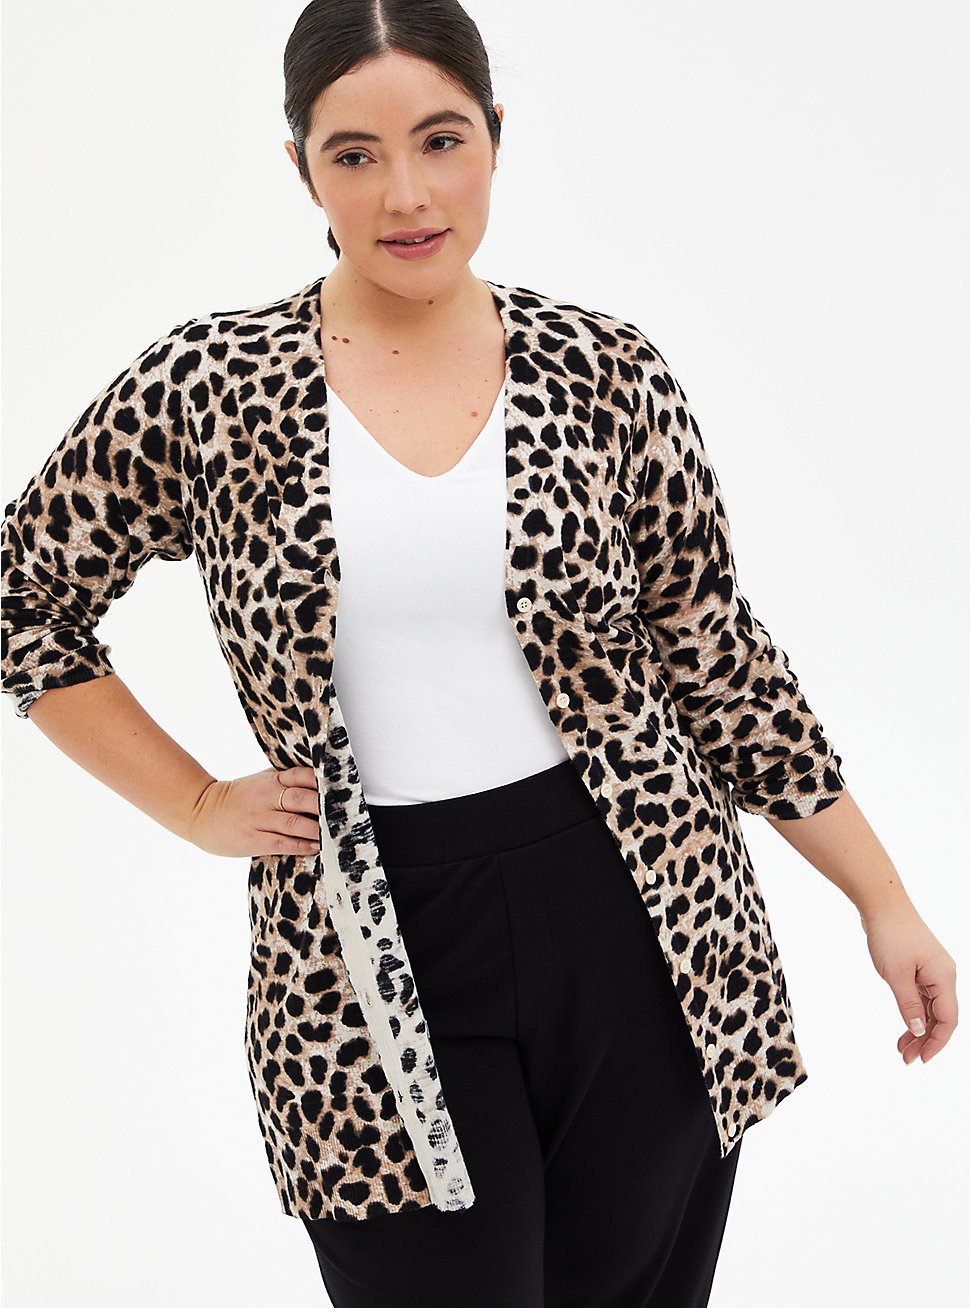 Leopard Textured Slub Boyfriend Cardigan, LEOPARD, hi-res